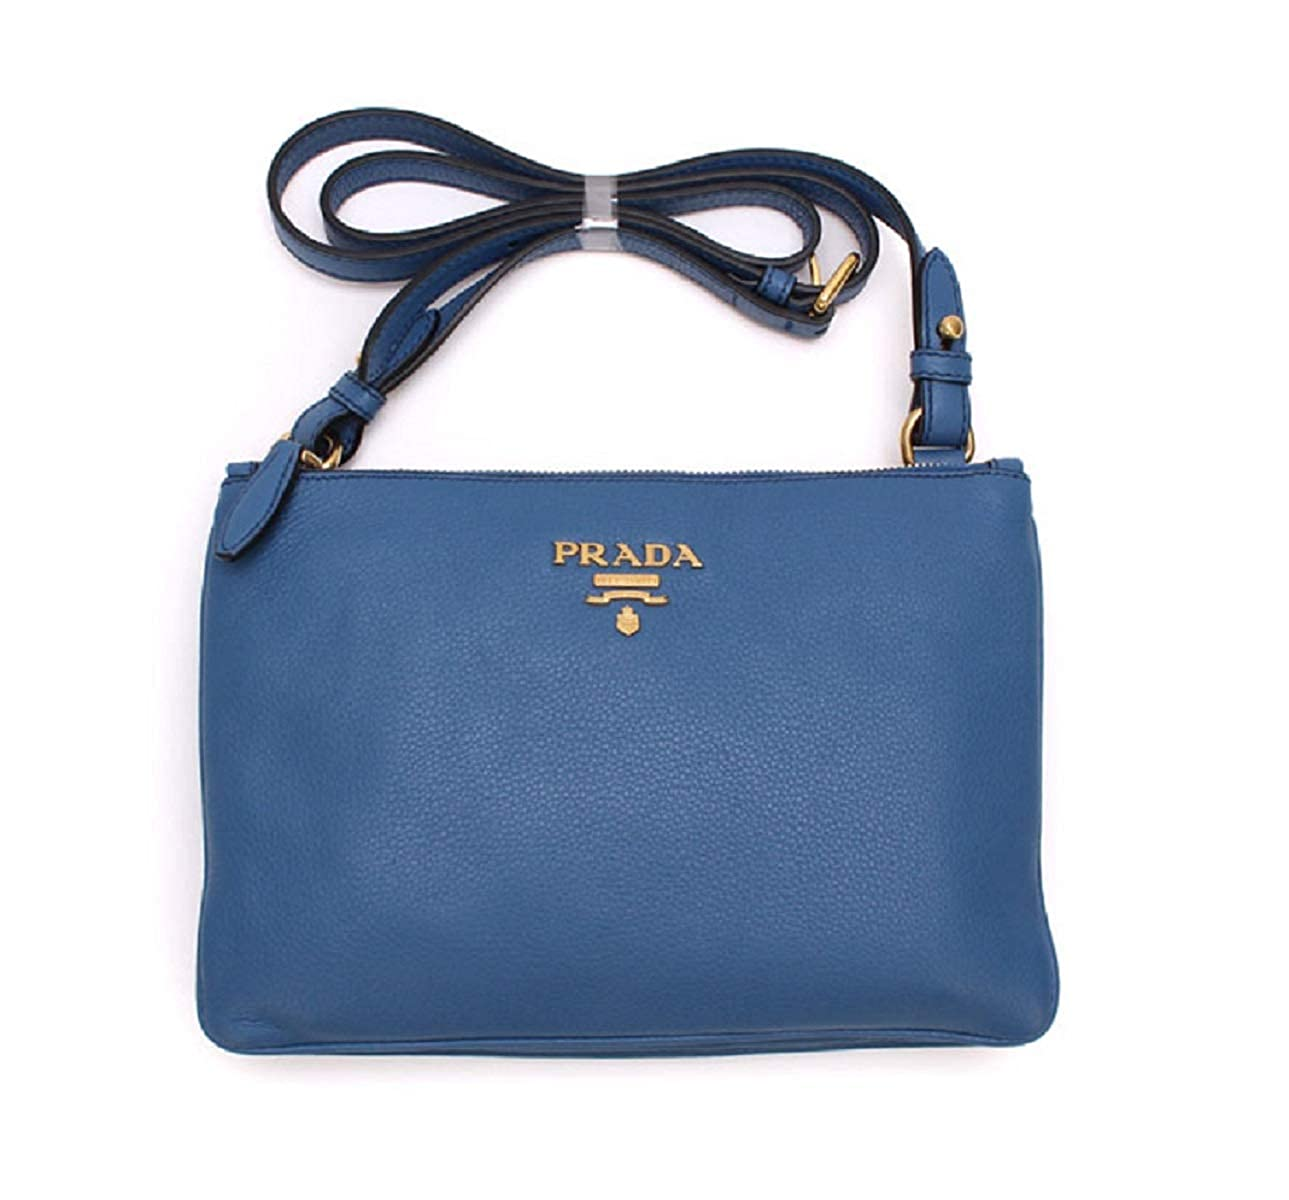 795427637904 Prada Women s Royal Blue Vitello Phenix Leather Cross Body Bag Handbag  1BH046  Handbags  Amazon.com